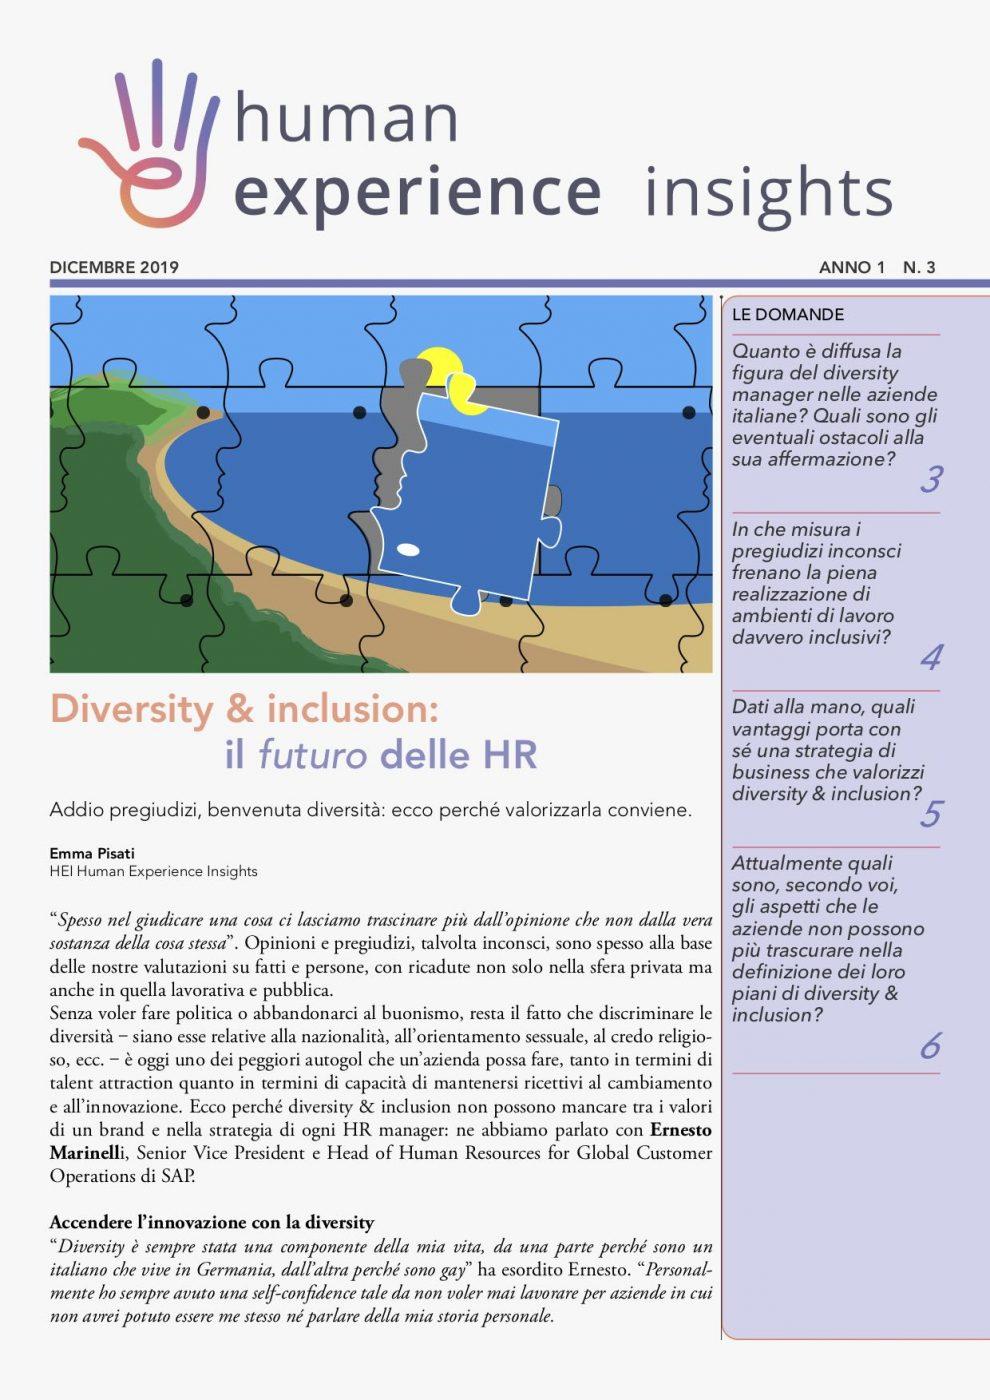 Diversity management – HEI anno 1 n. 3